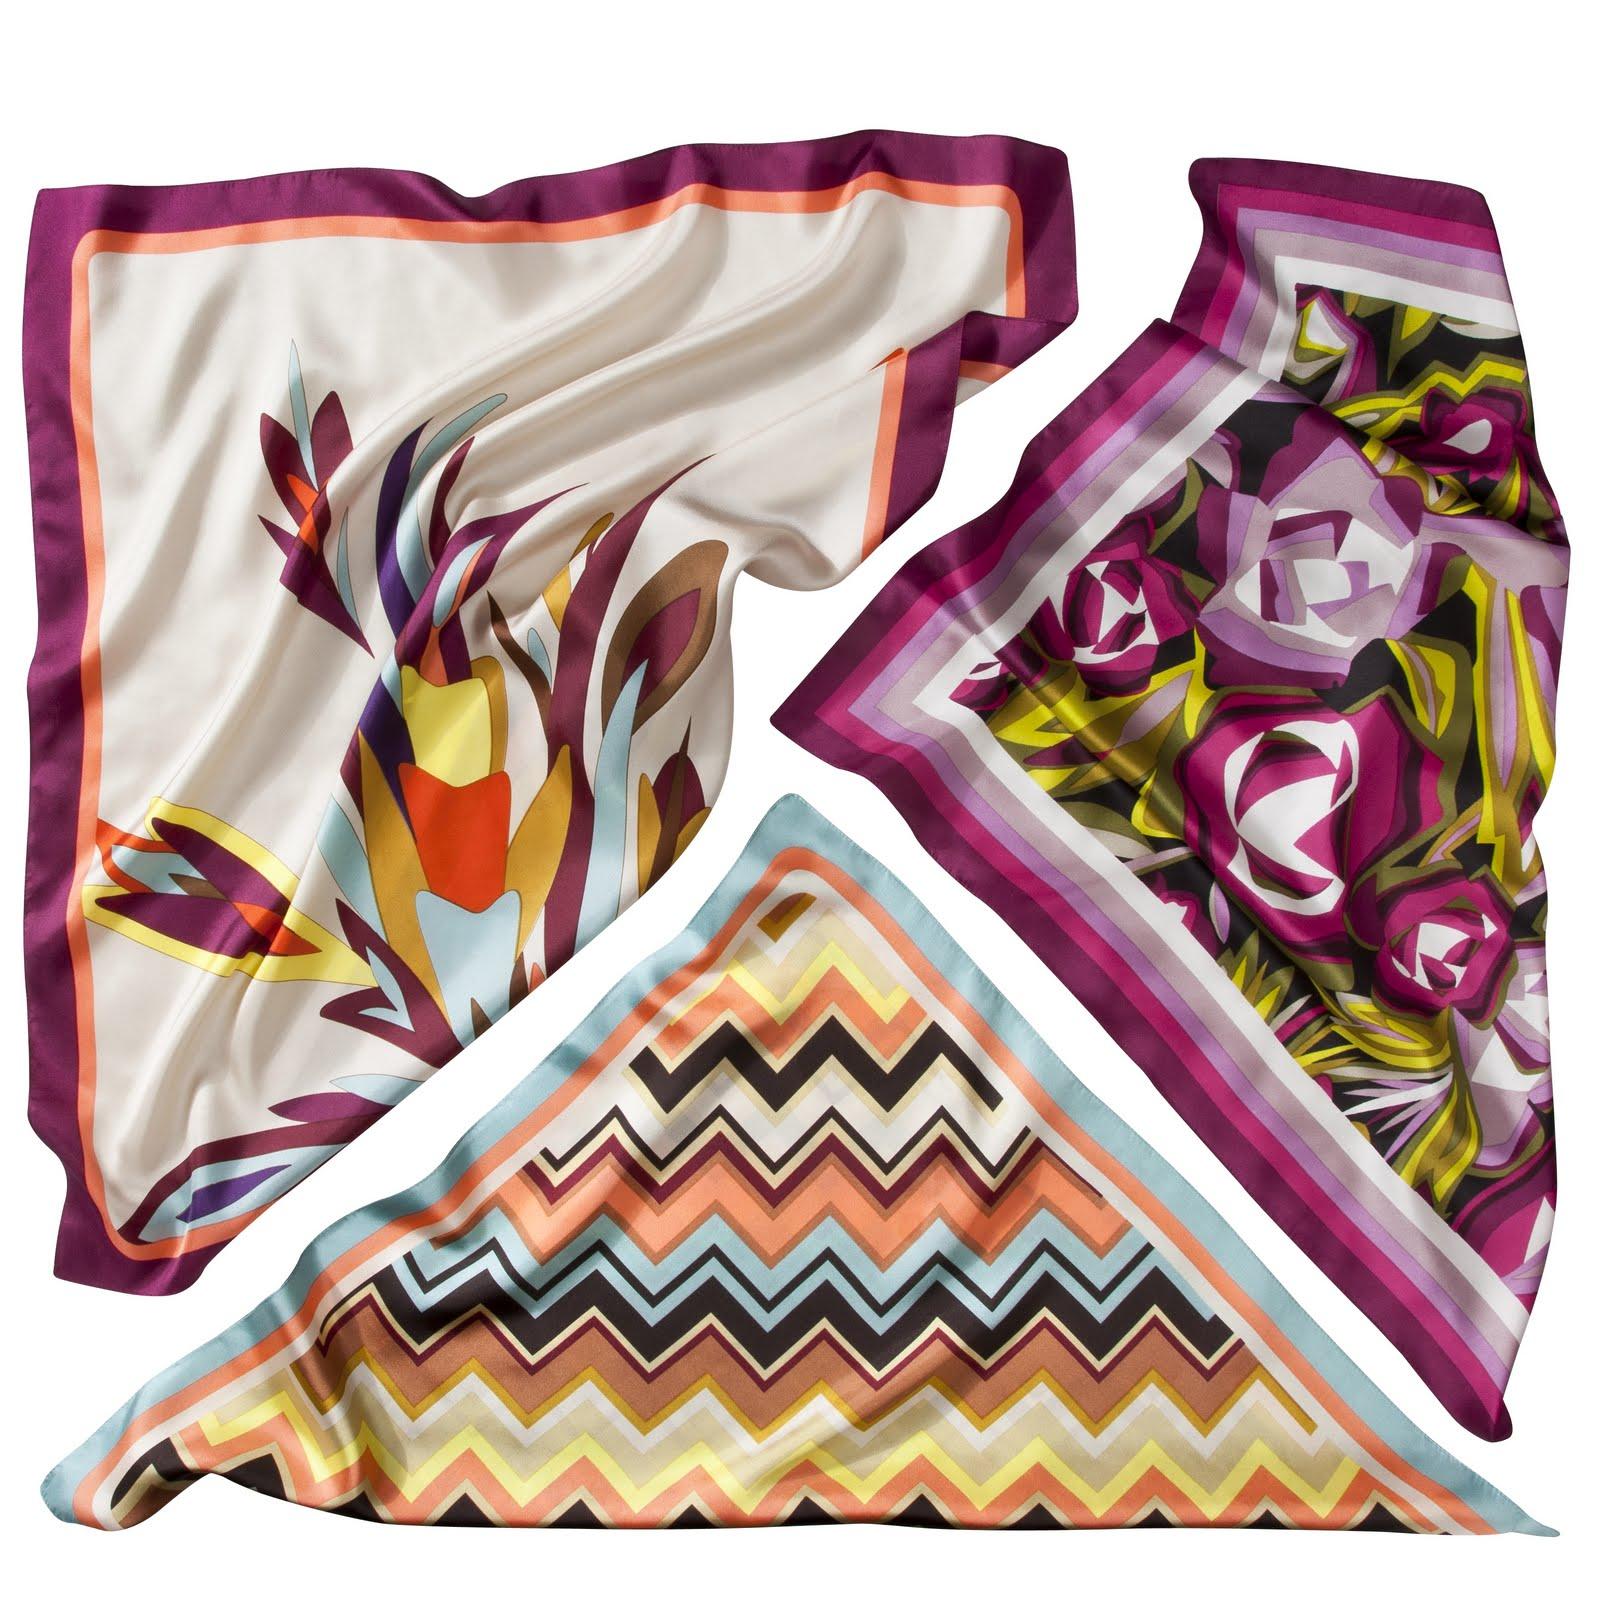 http://1.bp.blogspot.com/-td0JGsjbAkA/Tksk2GqeGRI/AAAAAAAAD90/cgha1lxswRA/s1600/Missoni+Target+silk+scarves.jpg